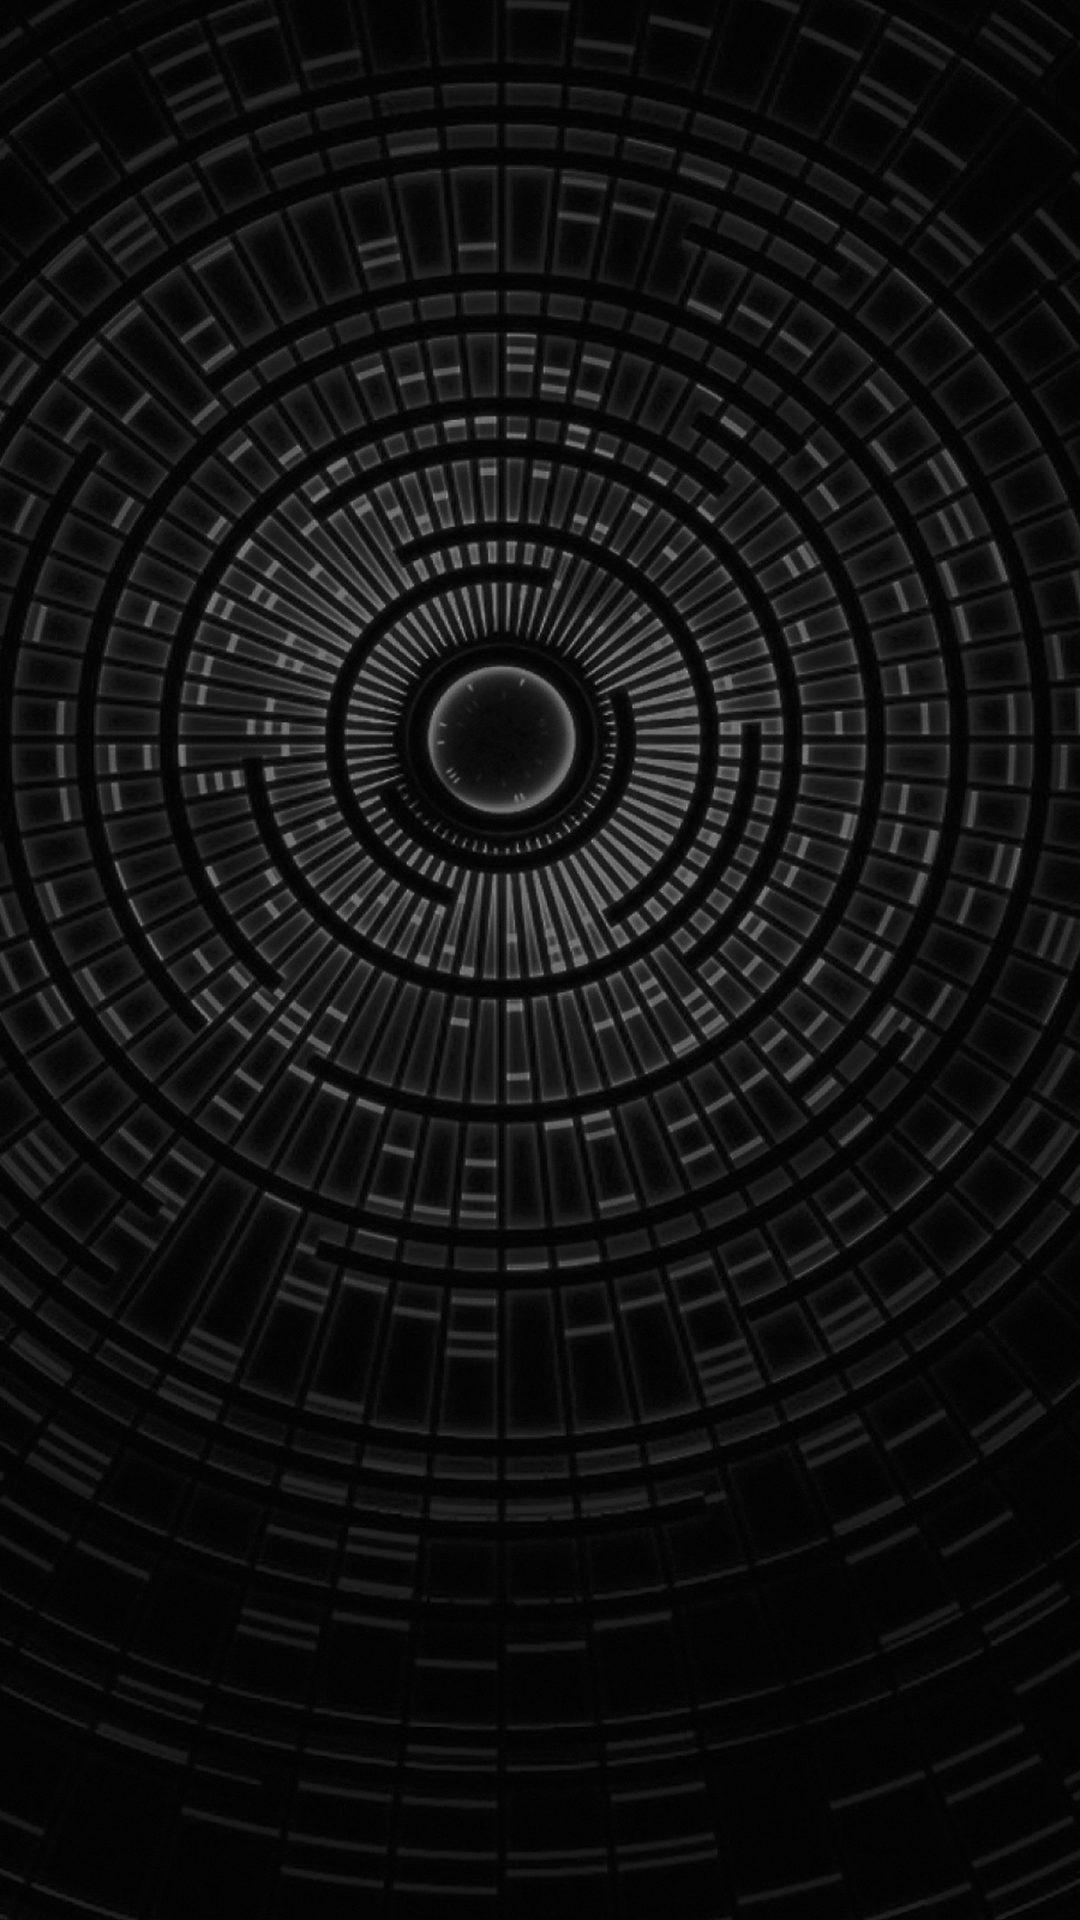 Circle Hole Dark Bw Abstract Pattern